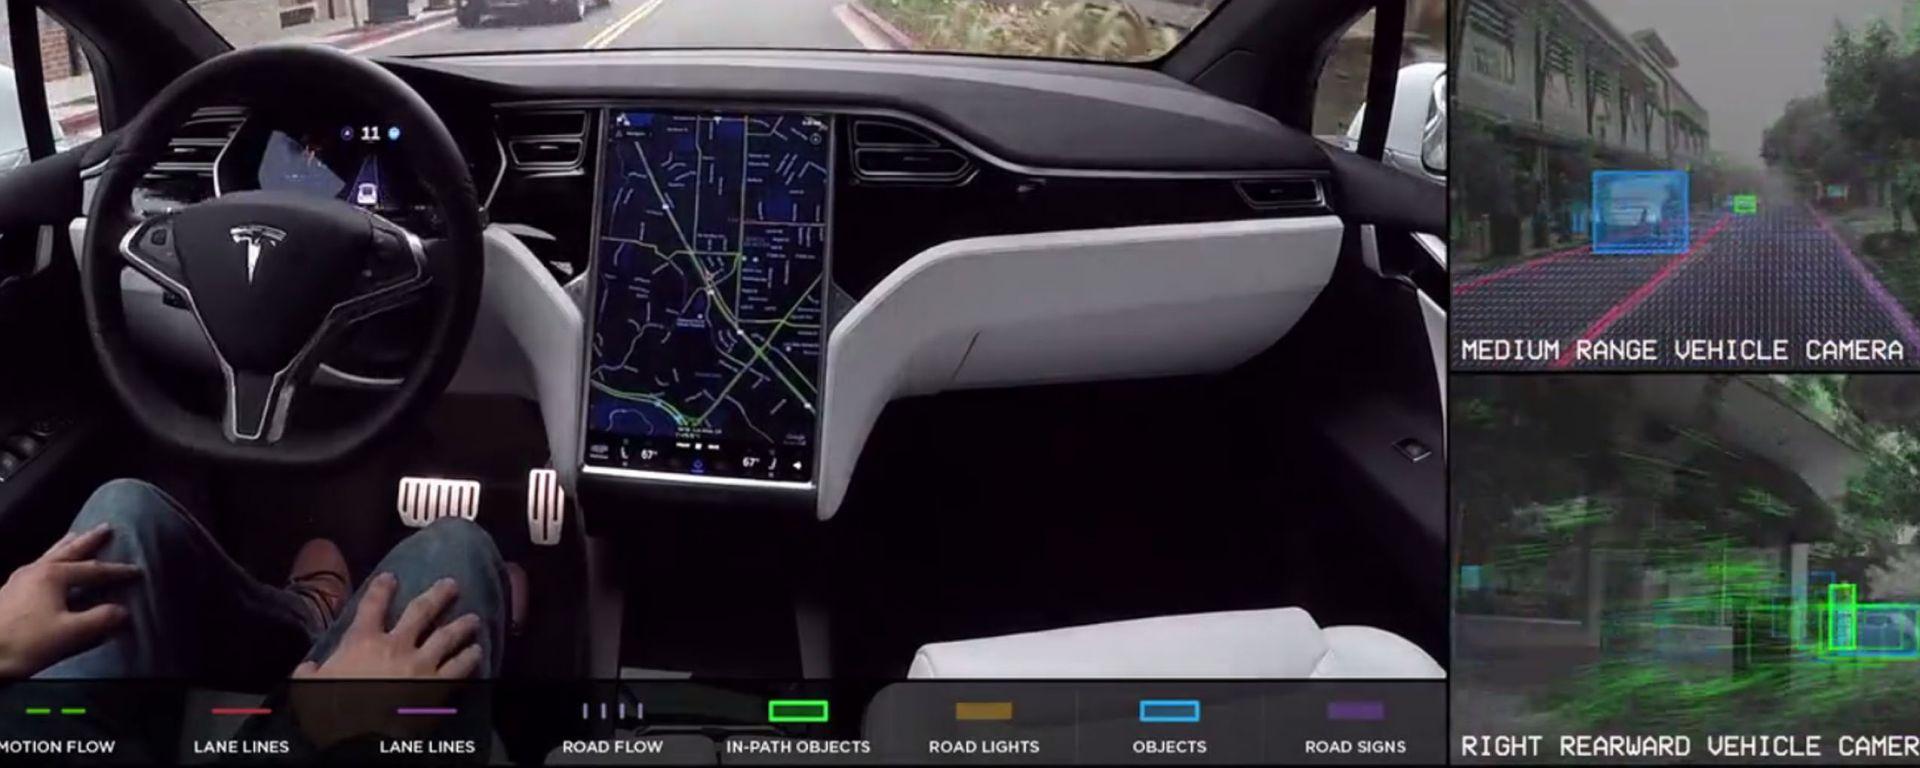 Guida autonoma: messa a punto dell'Autopilot Tesla